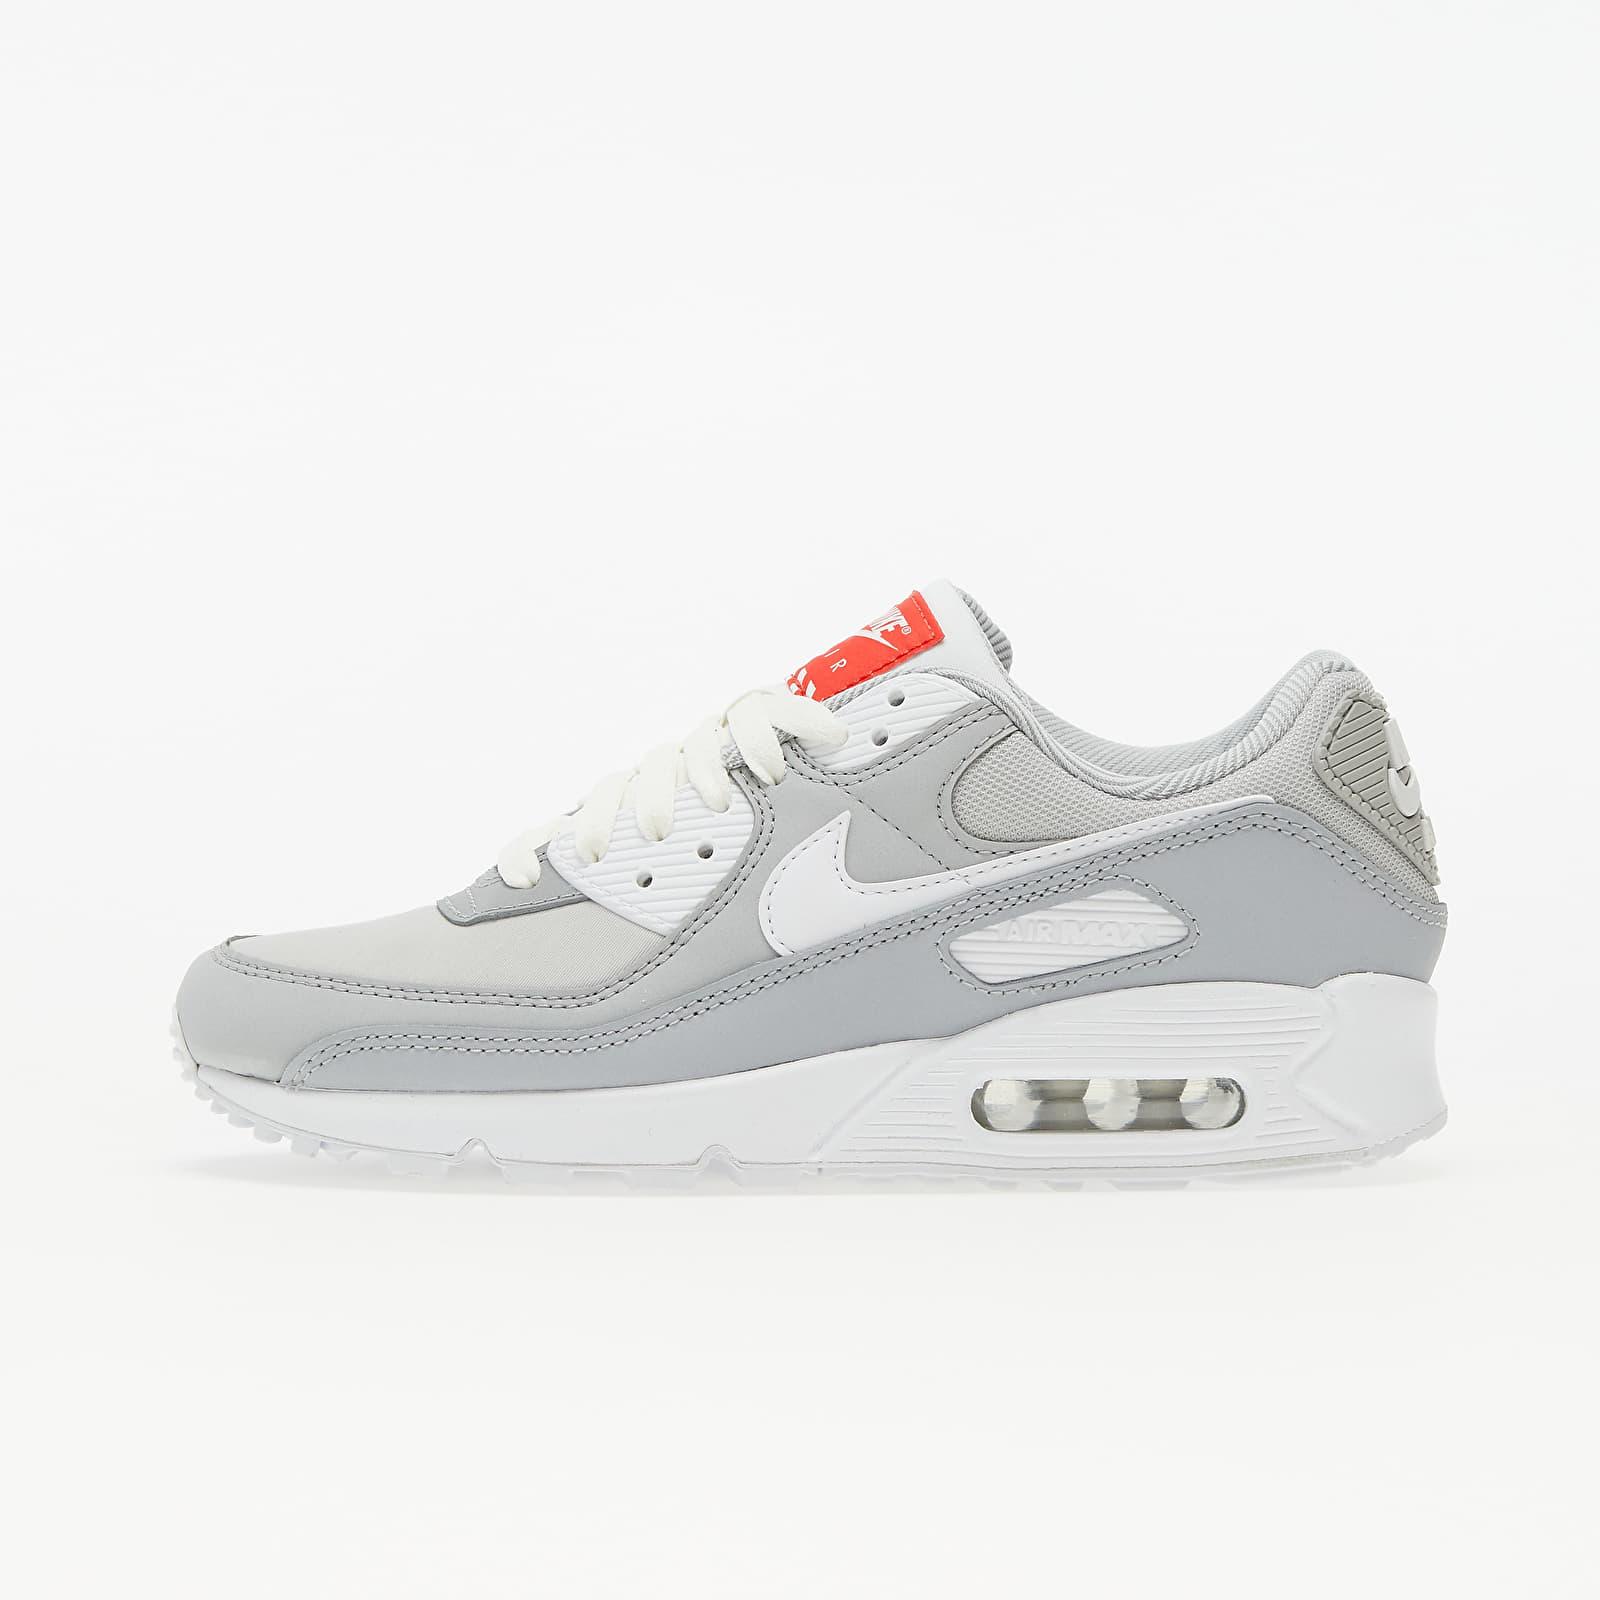 Nike W Air Max 90 Lt Smoke Grey/ White-Summit White DJ1494-001